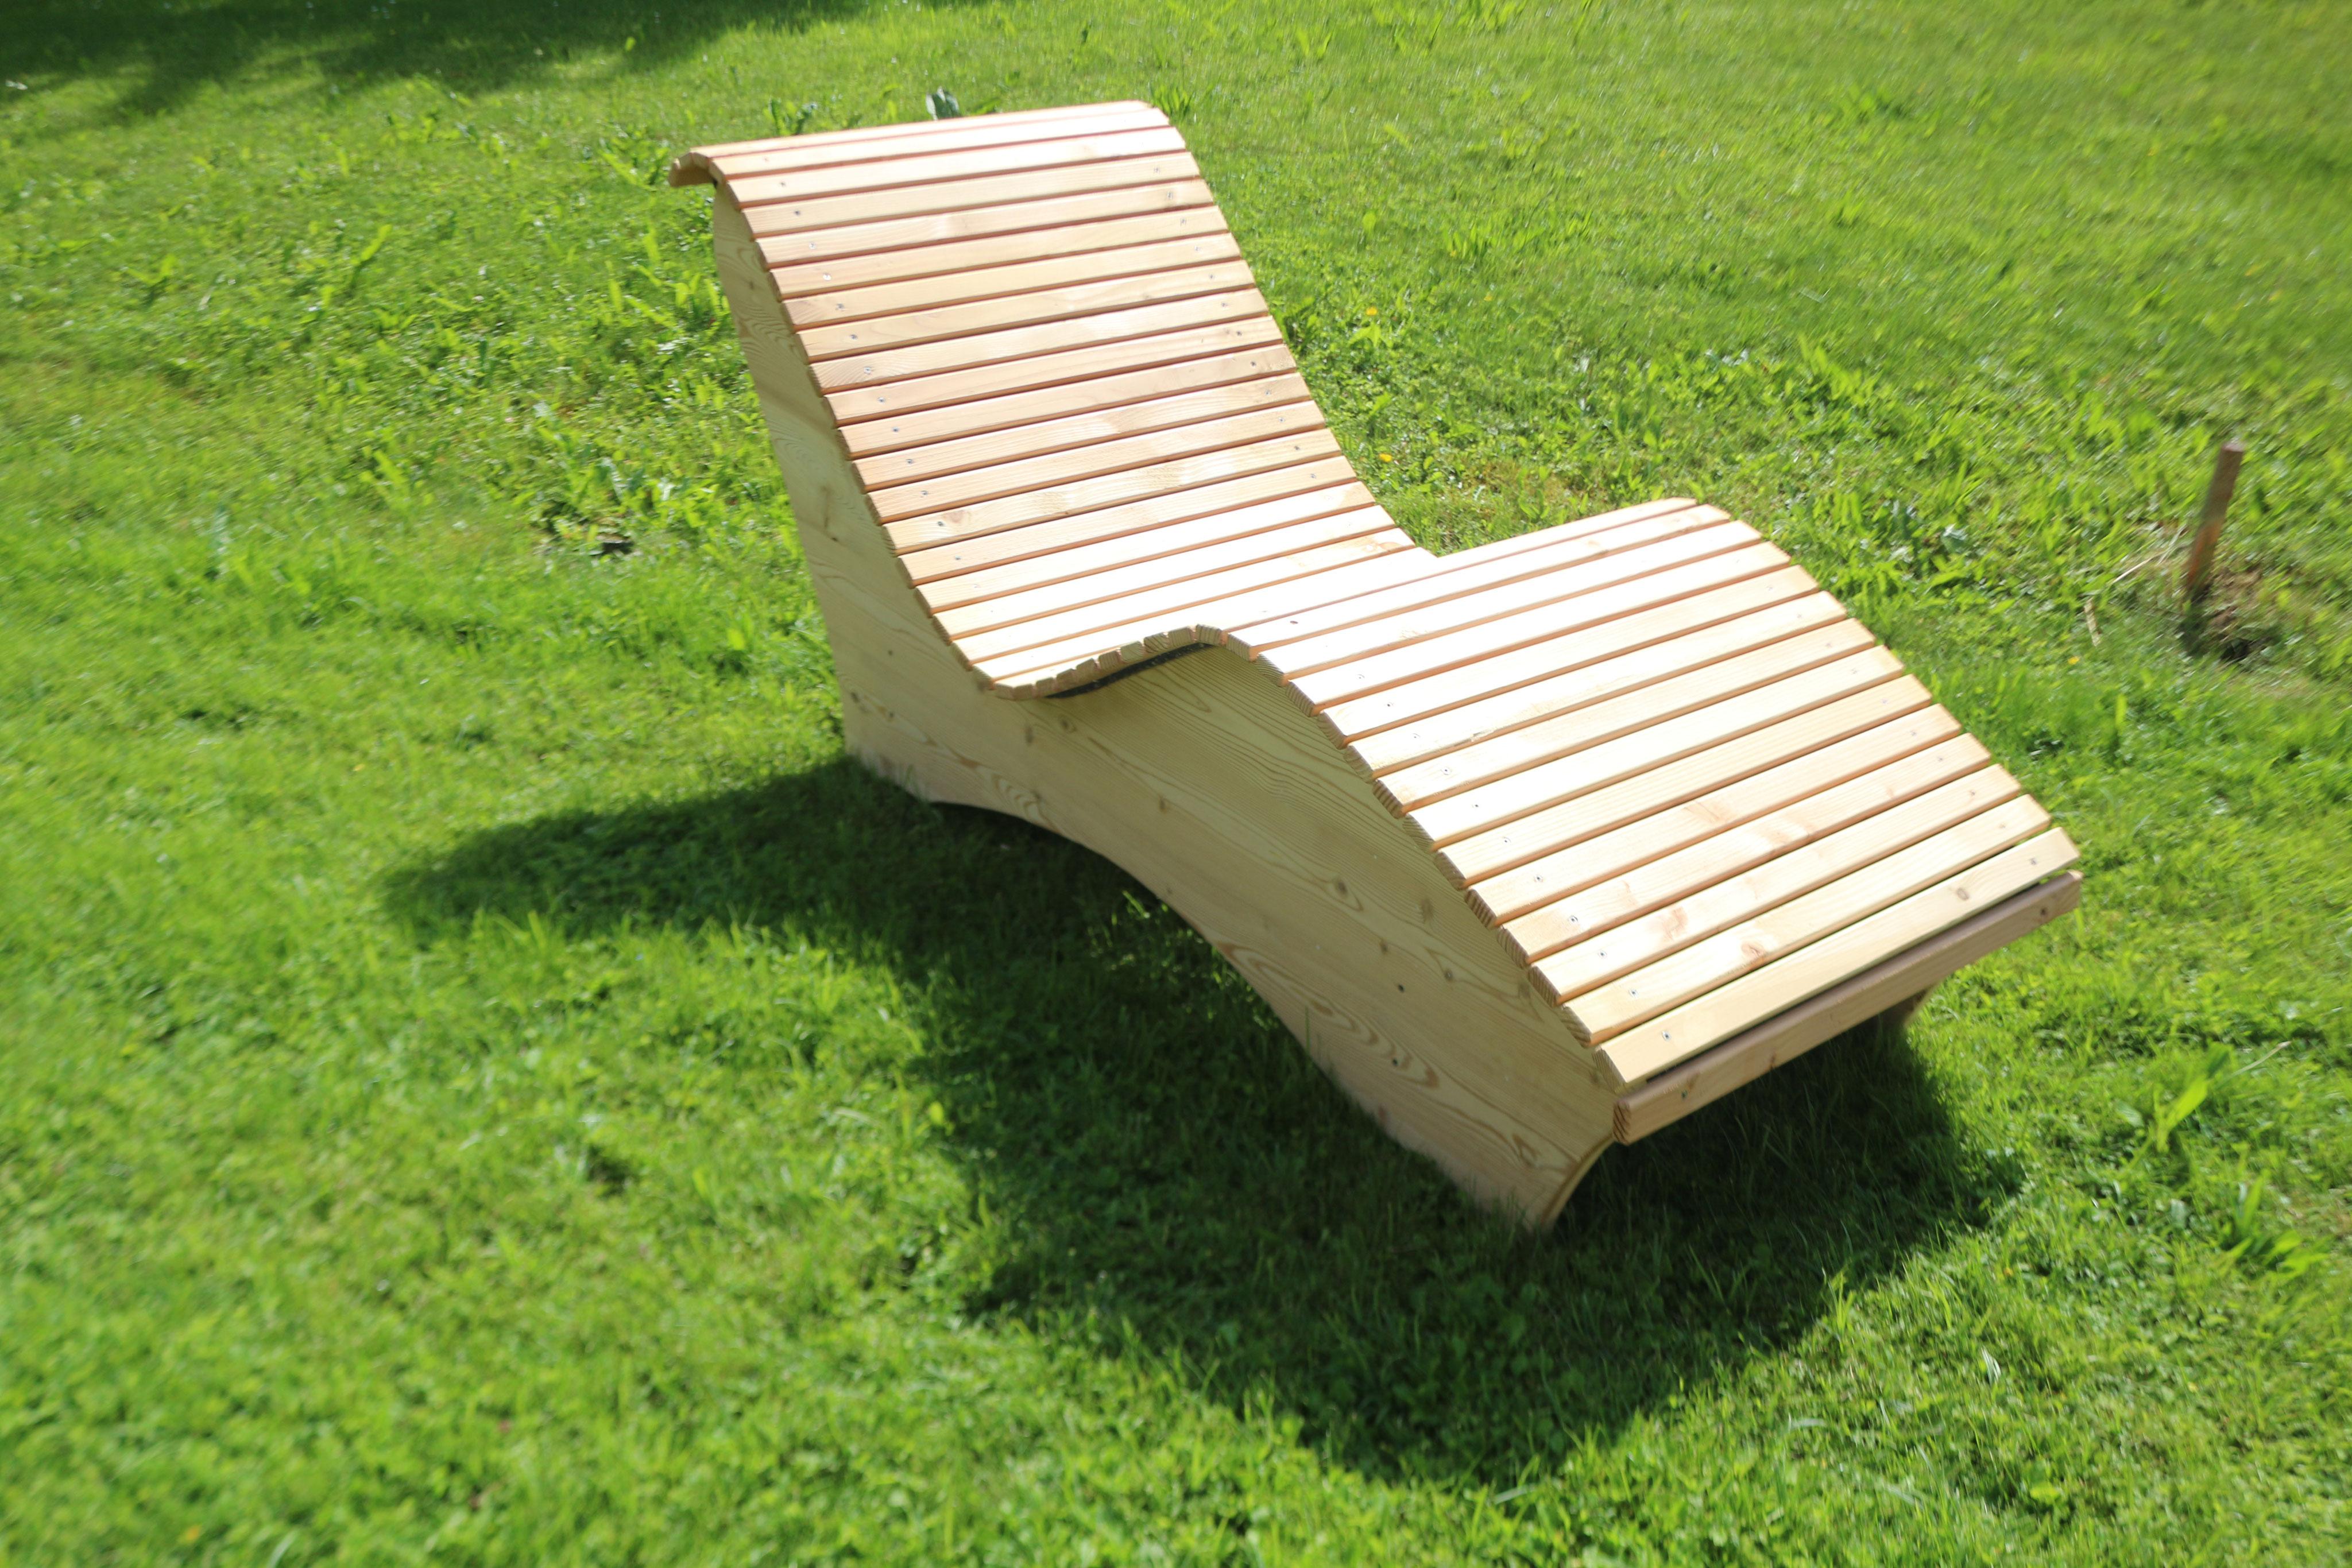 eggers sonnenliege aus holz sonnenlieges webseite. Black Bedroom Furniture Sets. Home Design Ideas